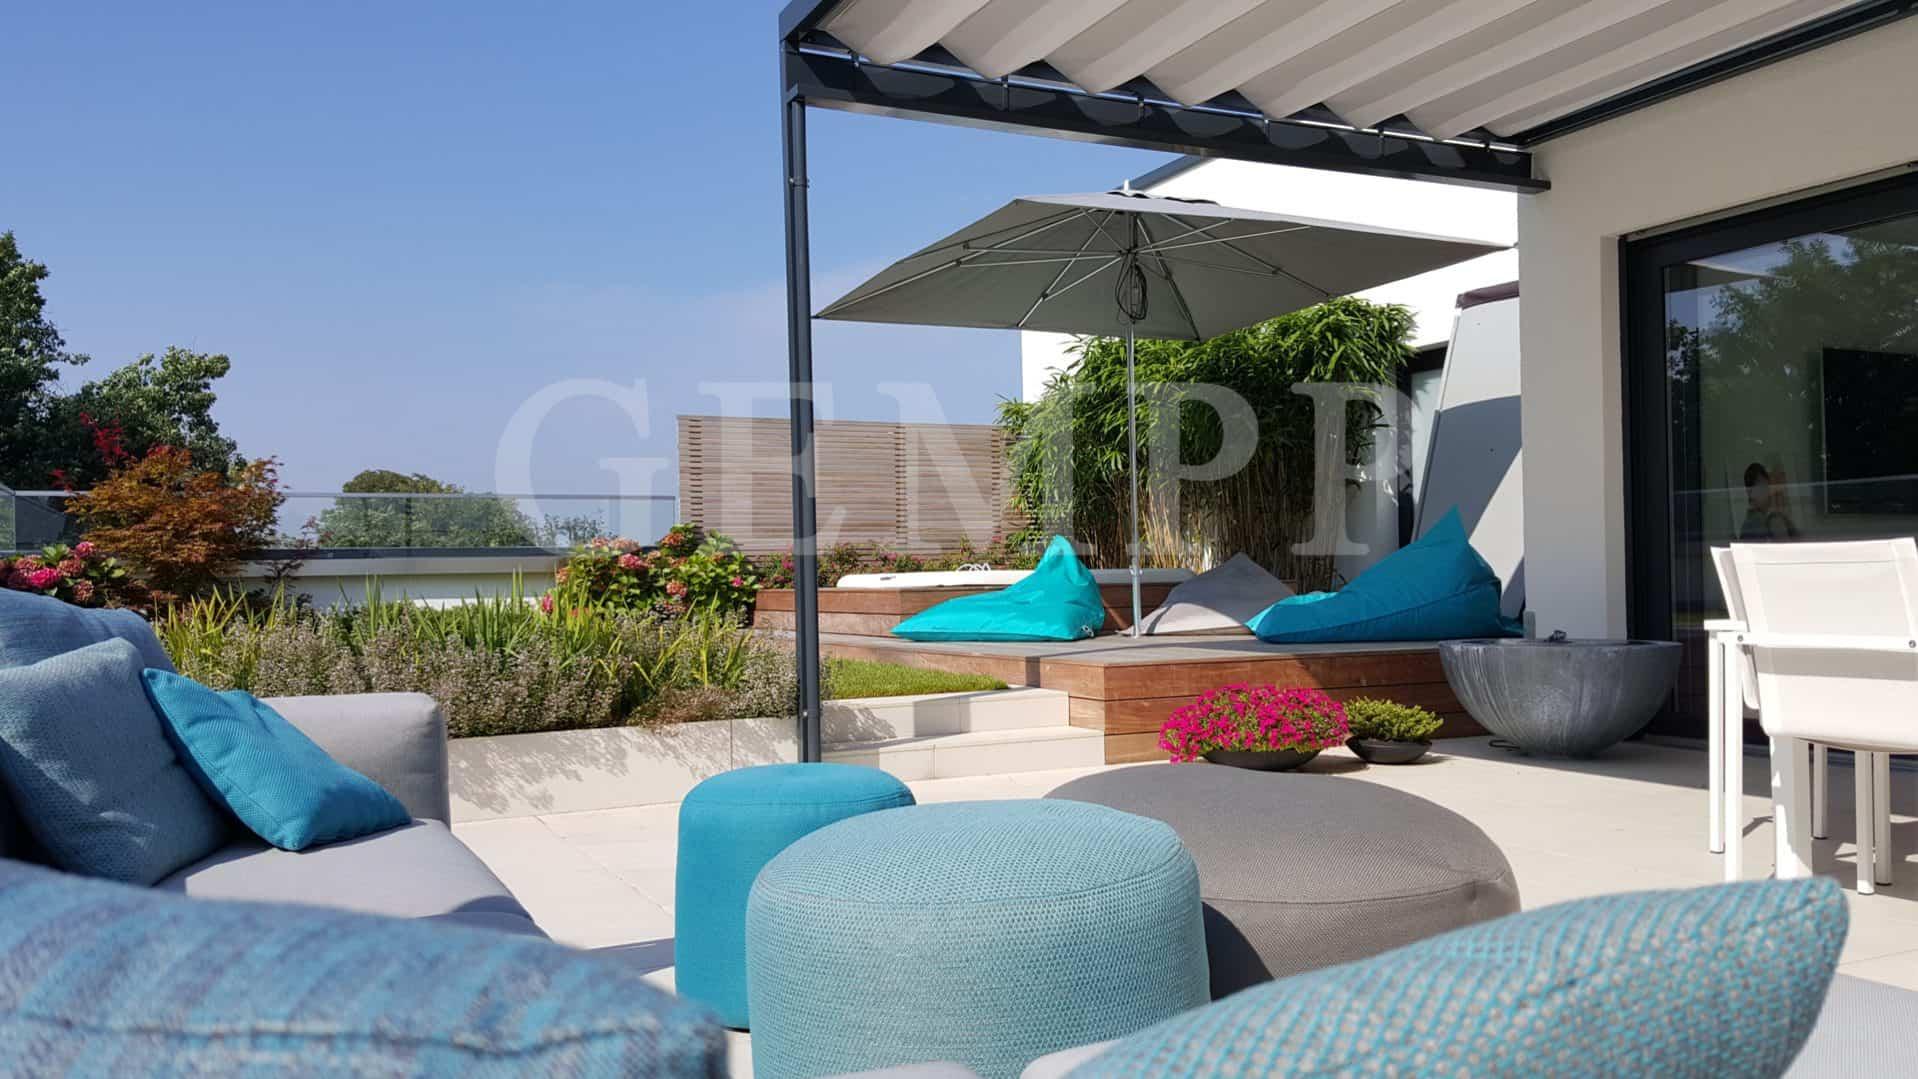 Dachterrasse Dachterrassengestaltung Penthouse Outdoor Whirlpool Hannover